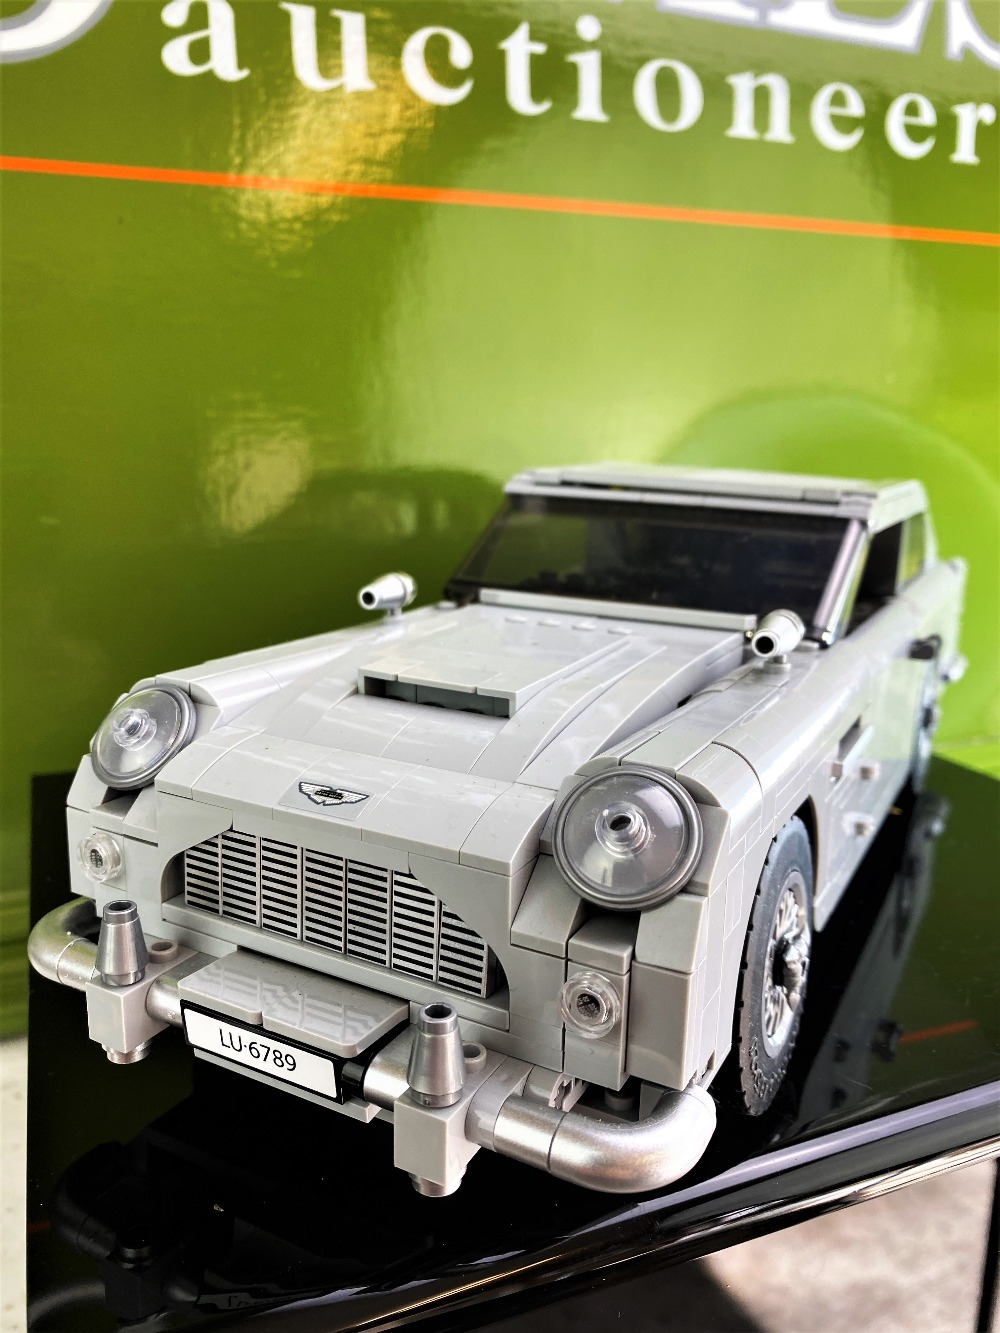 James Bond 007 Creator Lego Aston Martin DB5 Ref: 10262